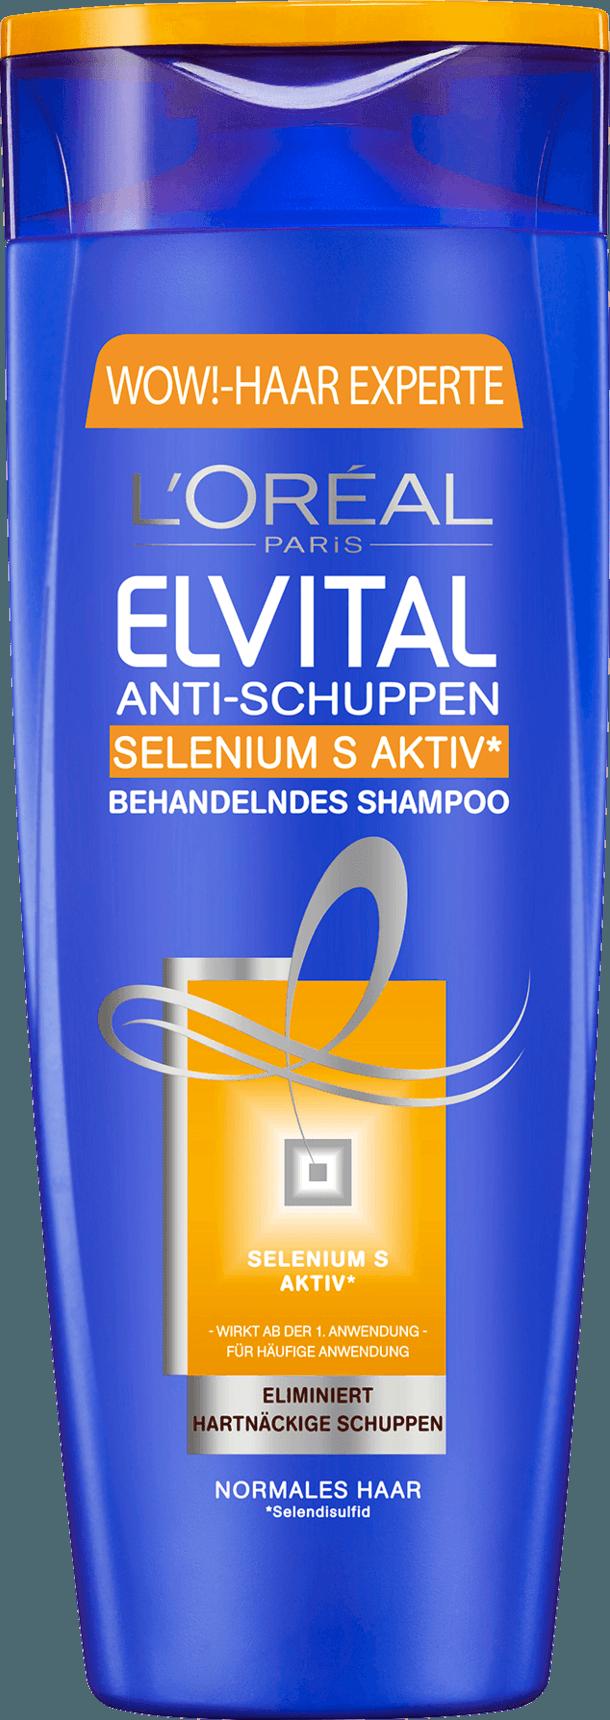 elvital anti schuppen selenium s aktiv